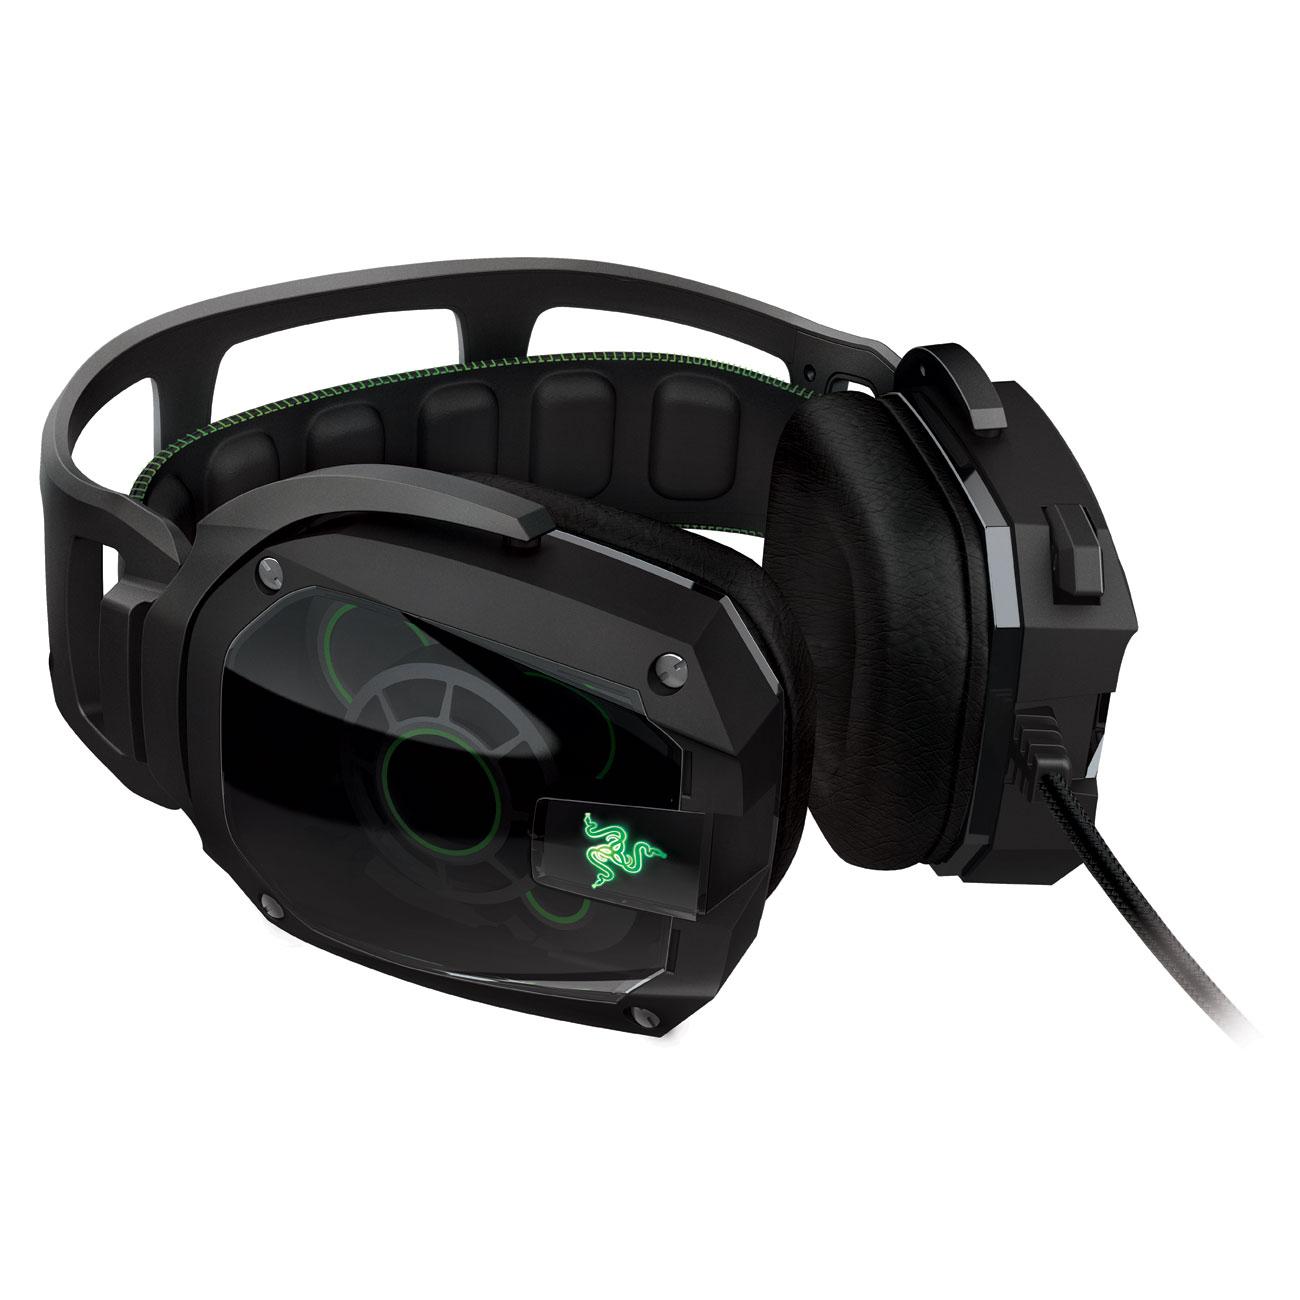 Razer Tiamat 7.1 V2 (RZ04-02070100-R3M1 **) - Achat / Vente Micro-casque sur Cybertek.fr - 2